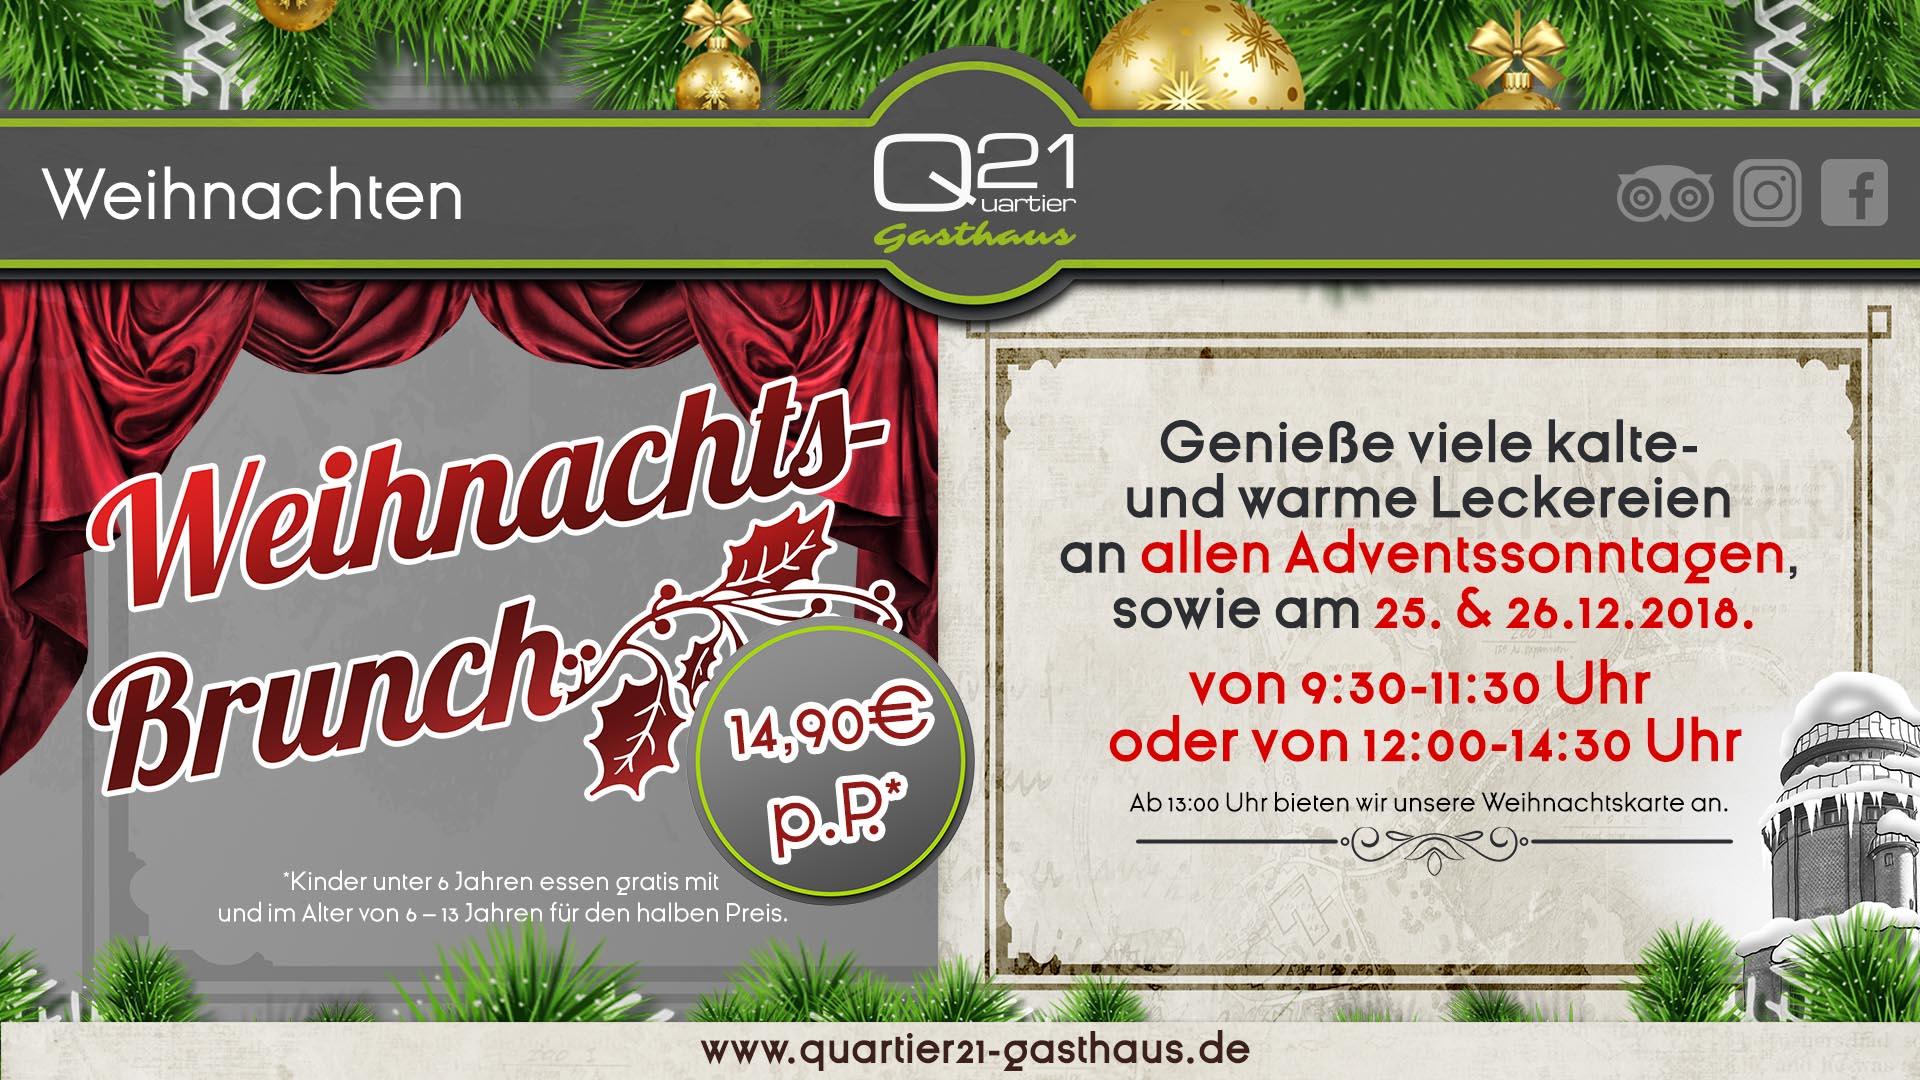 2018_10 TV Screen-Facebook HD Q21-Weihnachten - Quartier 21 Gasthaus